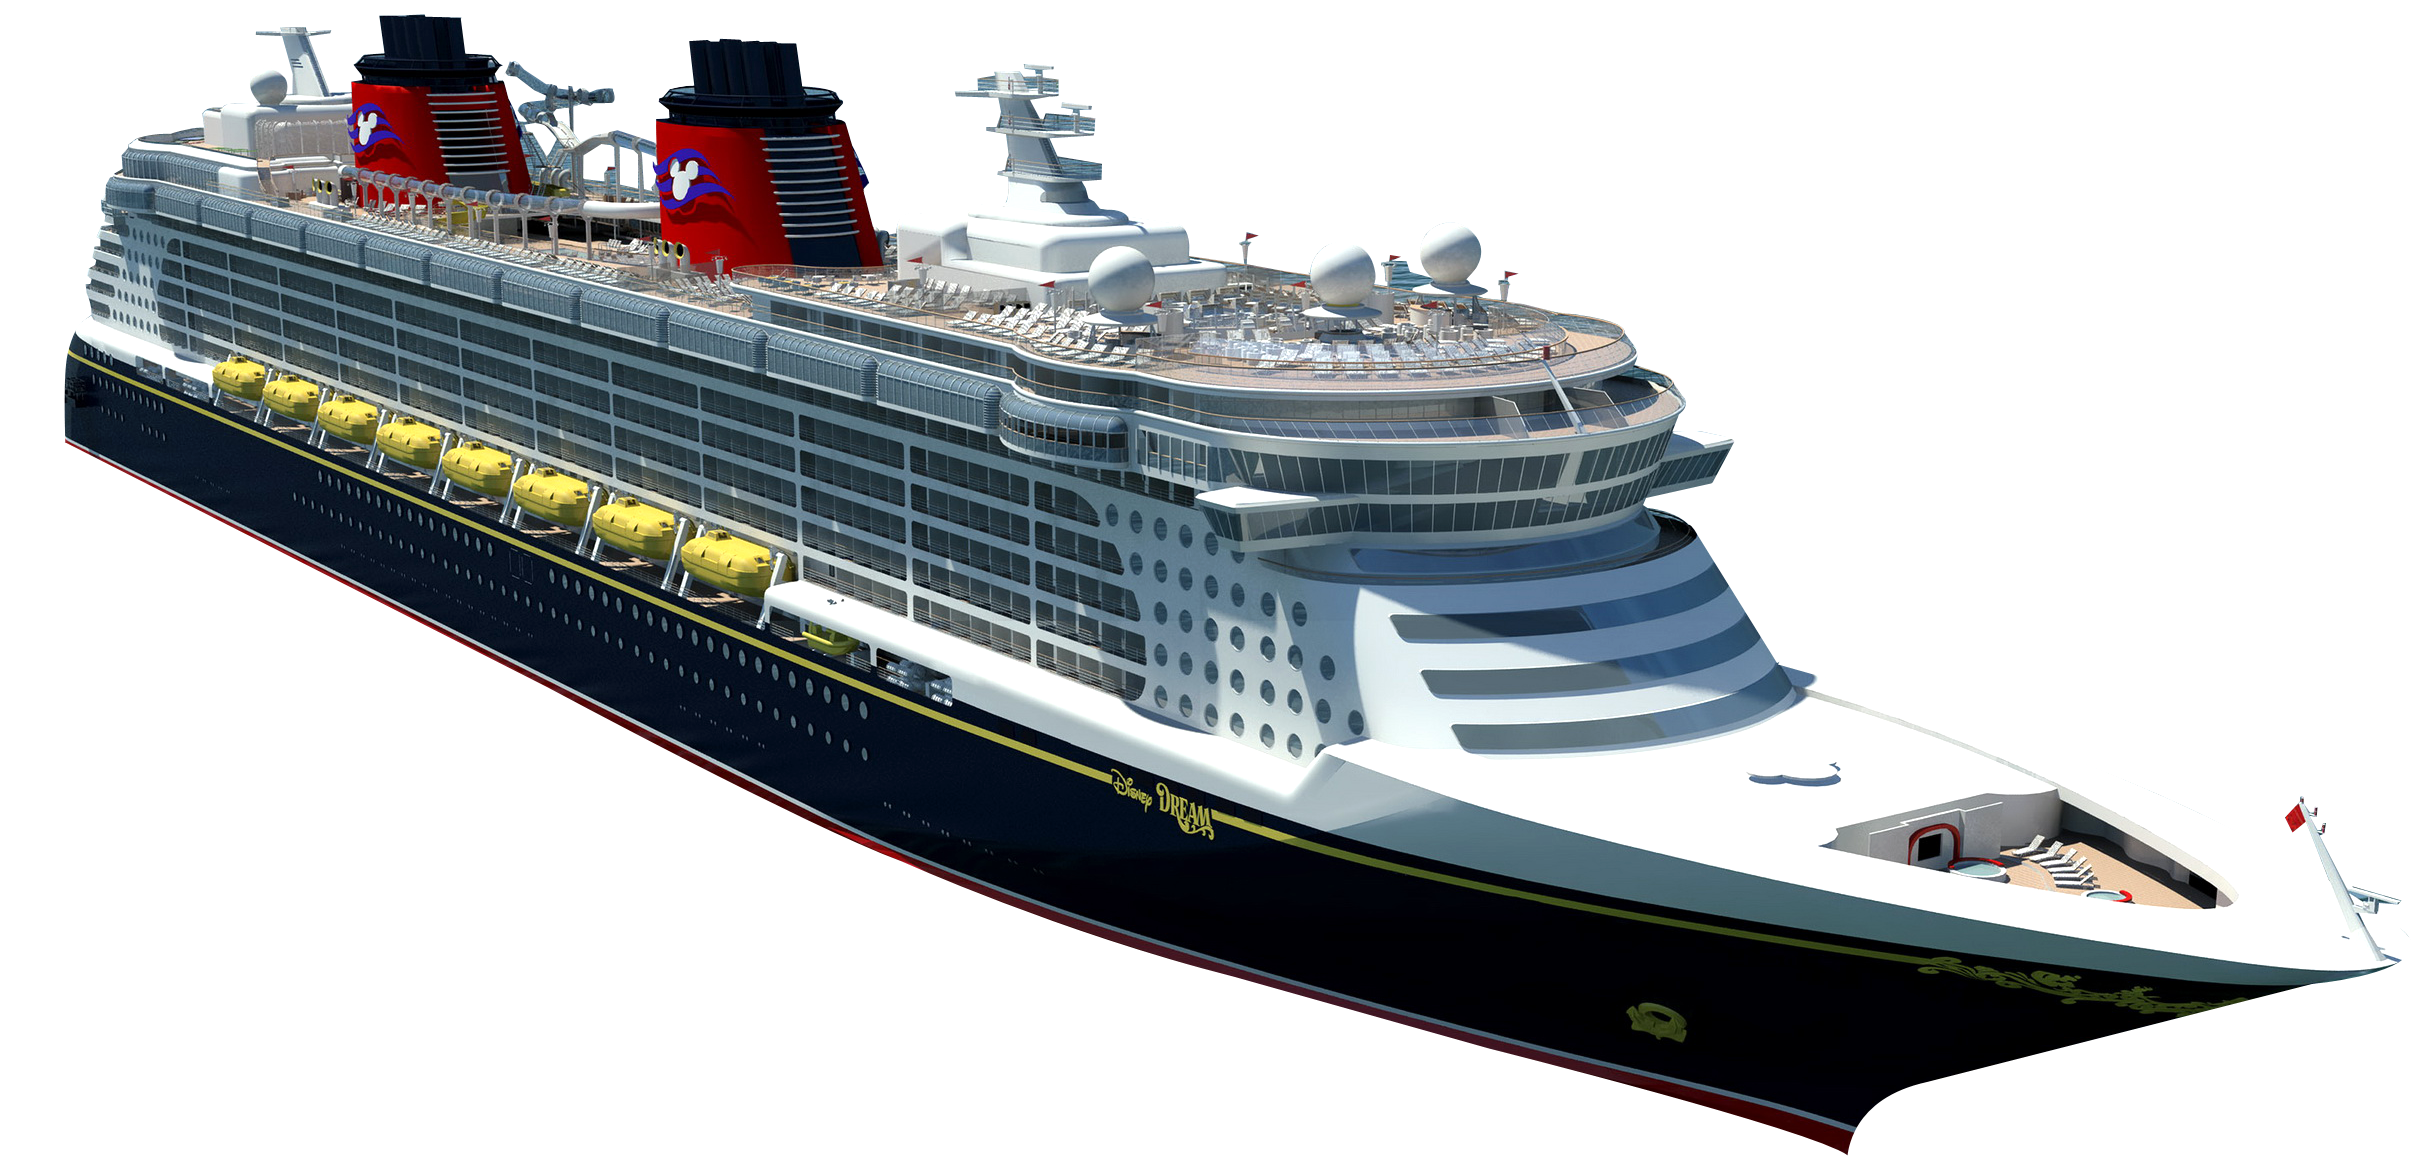 Hdpng - Cruise Ship, Transparent background PNG HD thumbnail